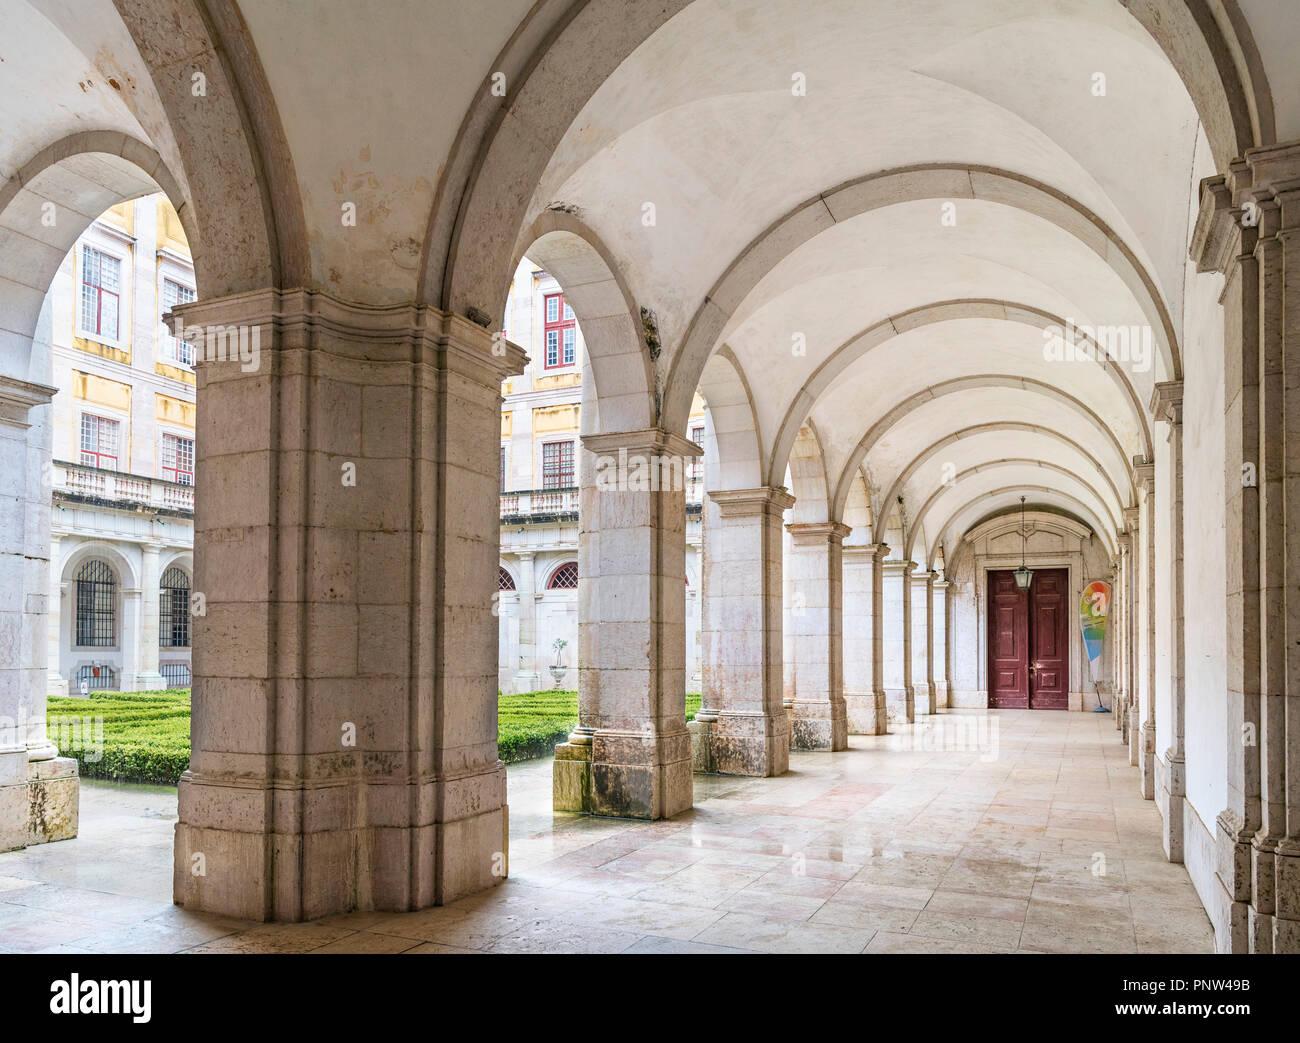 Cloisters in the Palace of Mafra ( Mosteiro Palacio Nacional de Mafra ), Mafra, Portugal - Stock Image